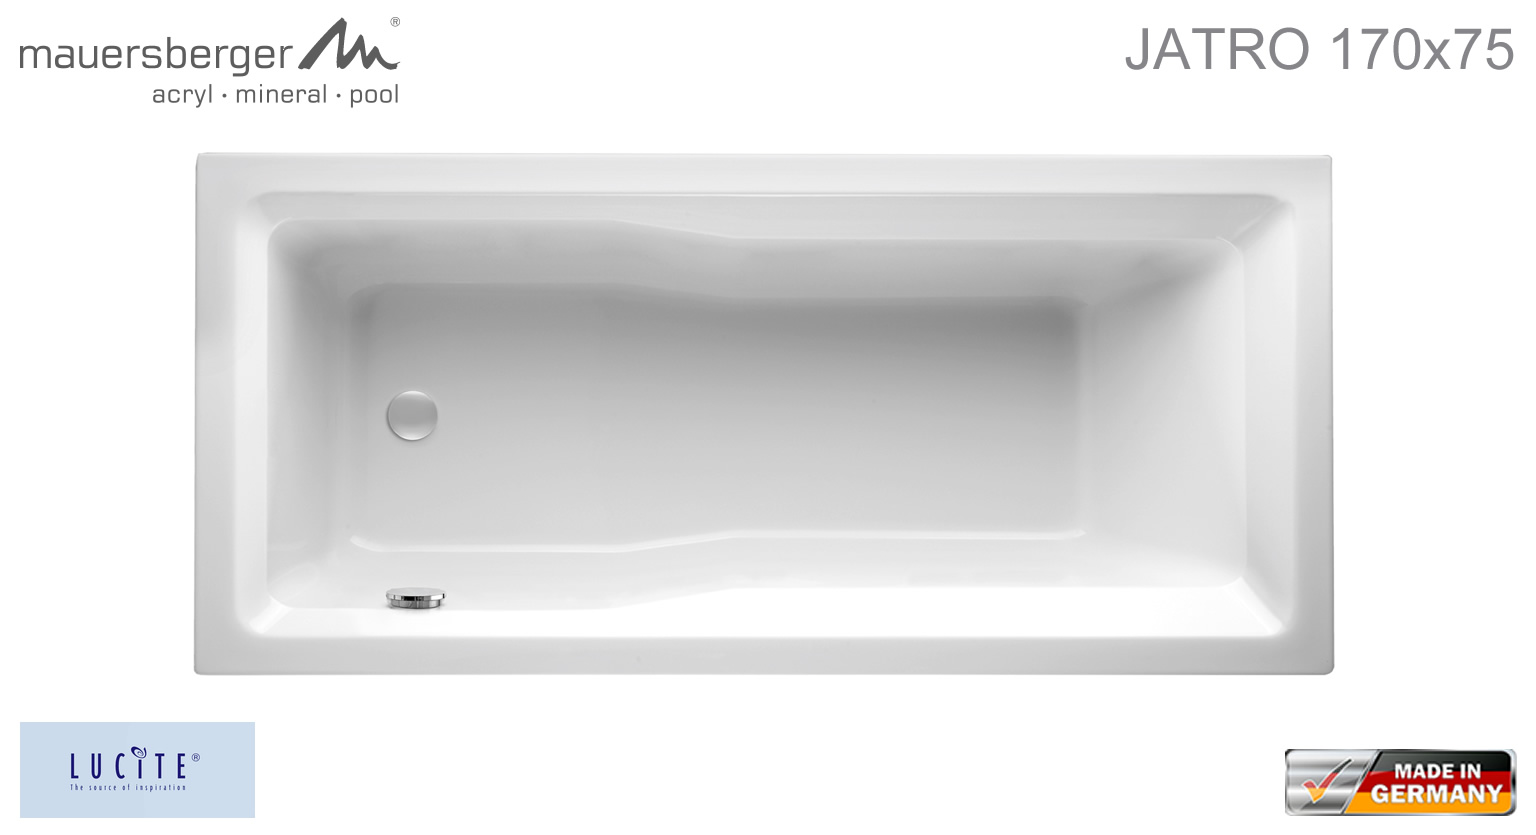 Bevorzugt Mauersberger Badewanne JATRO 170 x 75 cm - Rechteck - ACRYL WD17